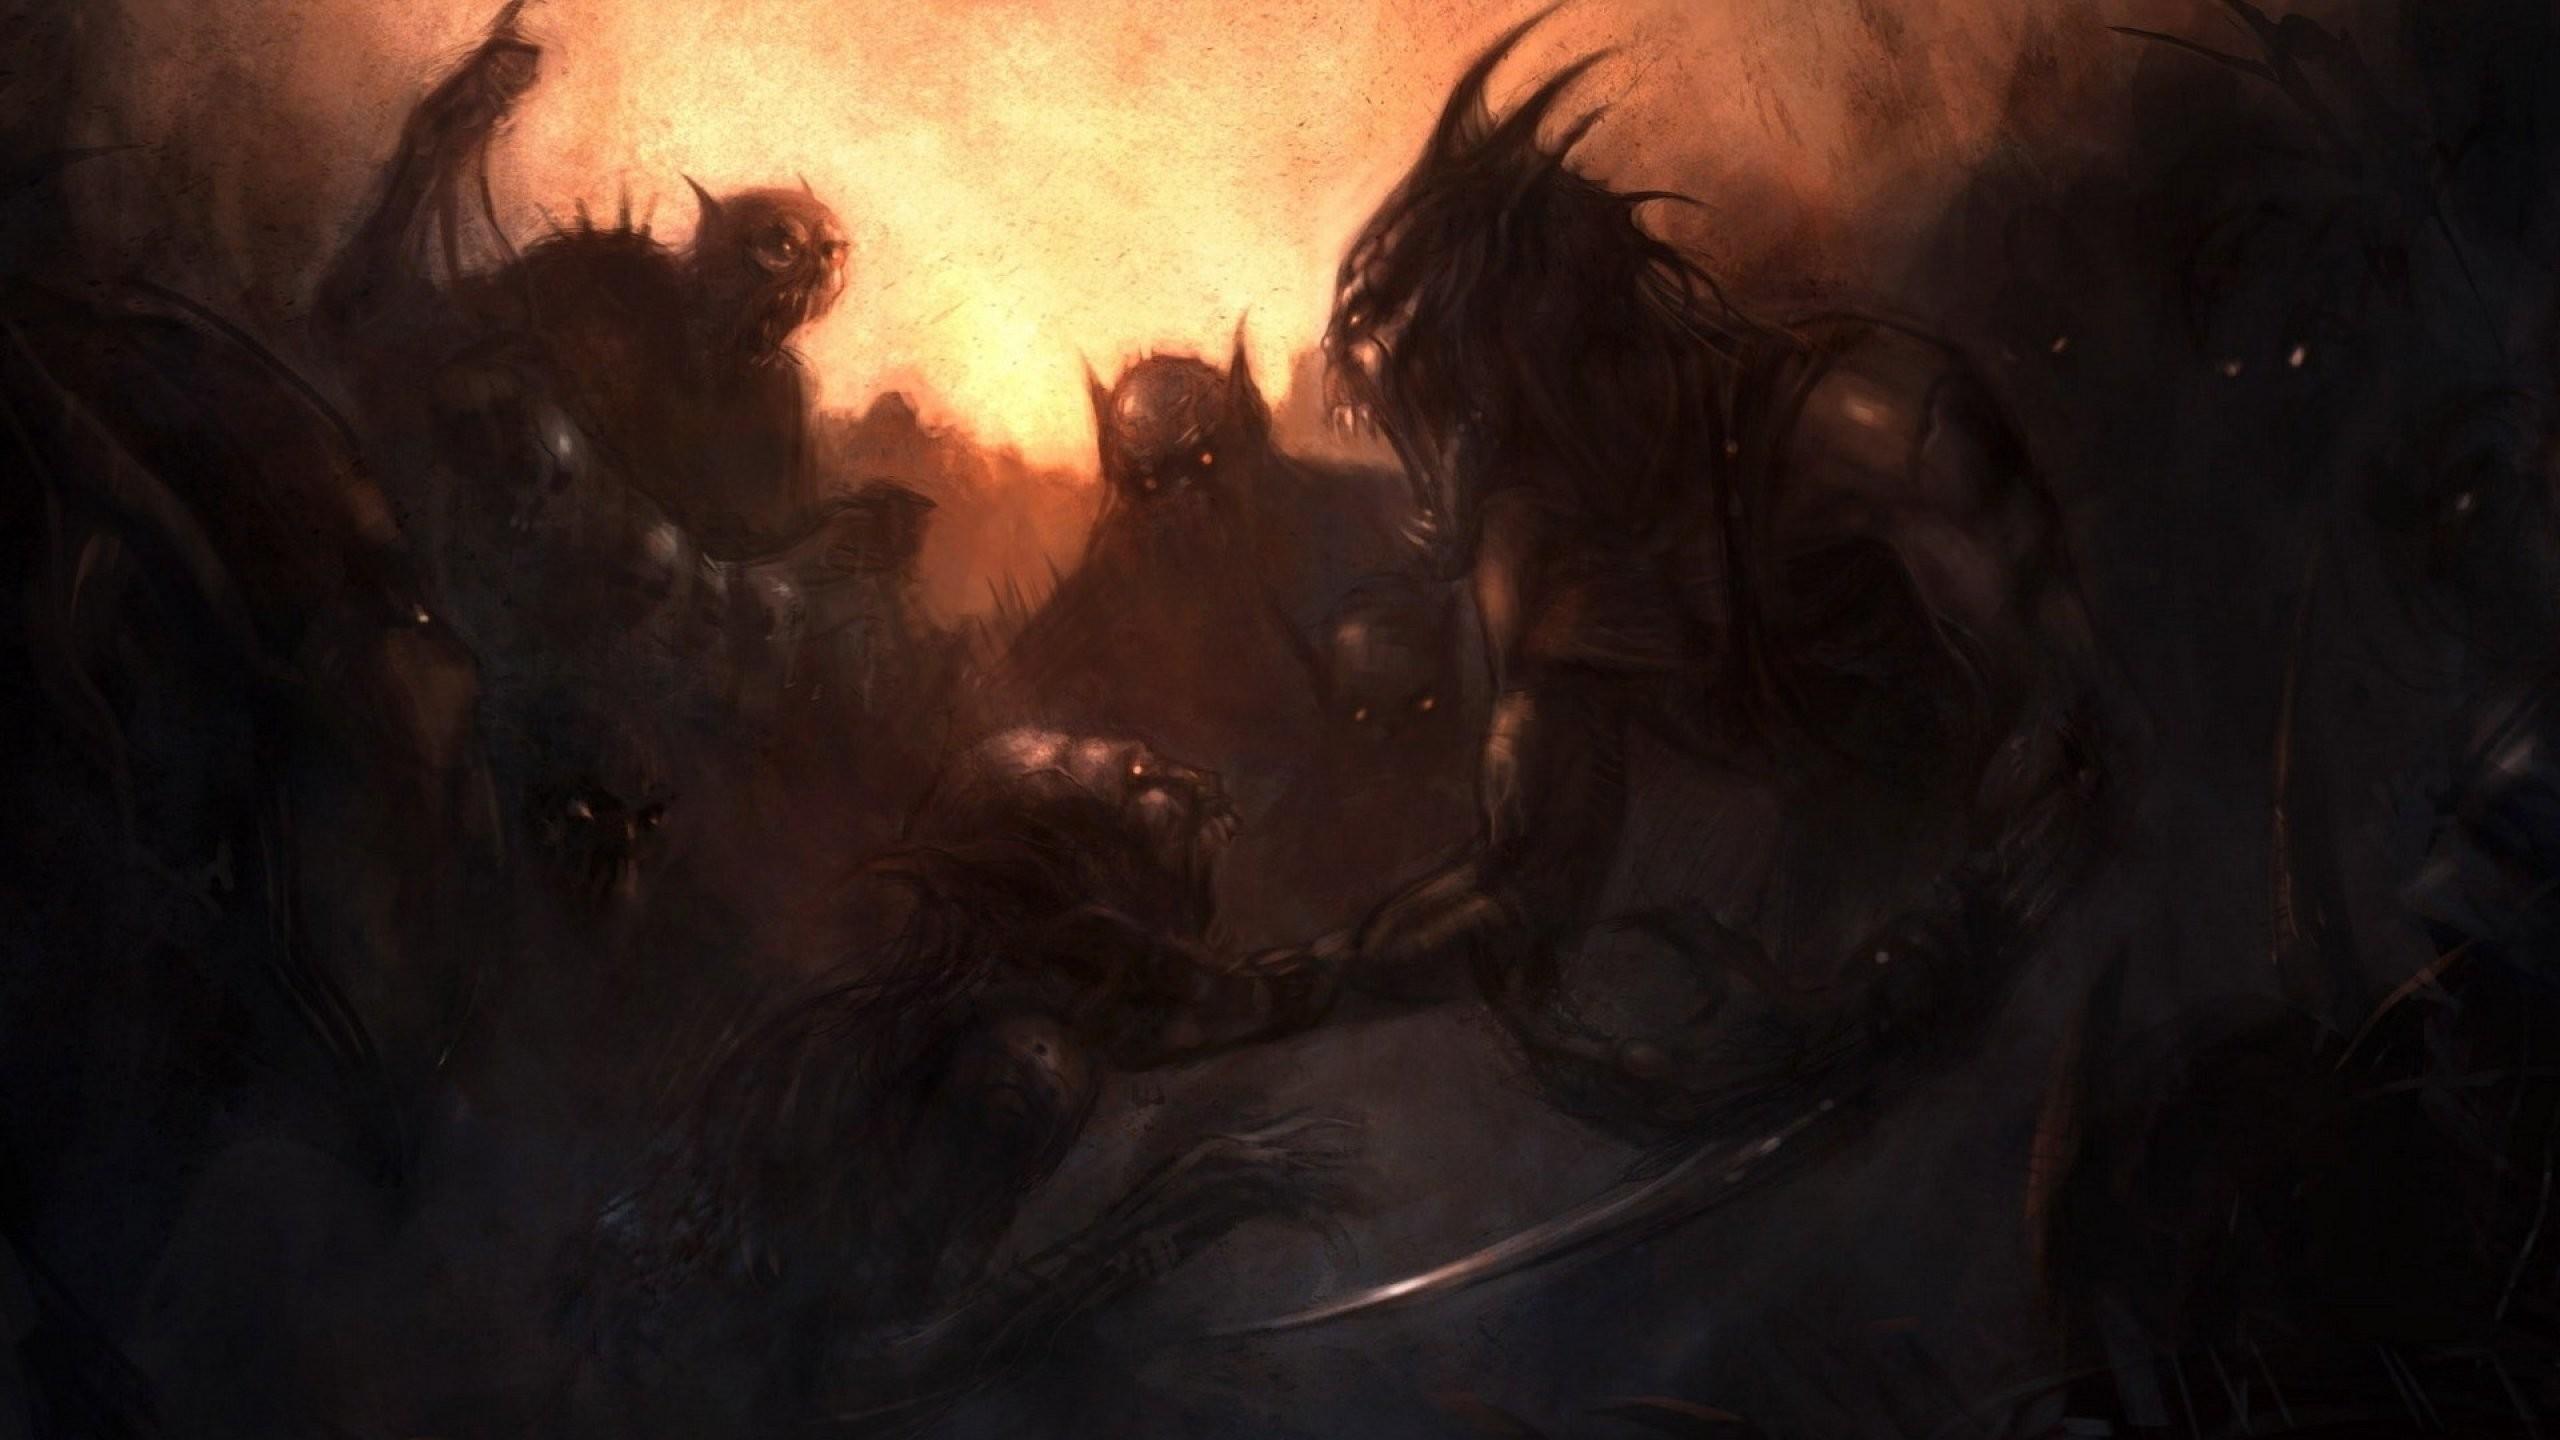 Res: 2560x1440, cartoon batman fantasy spawn movie artwork evil demons